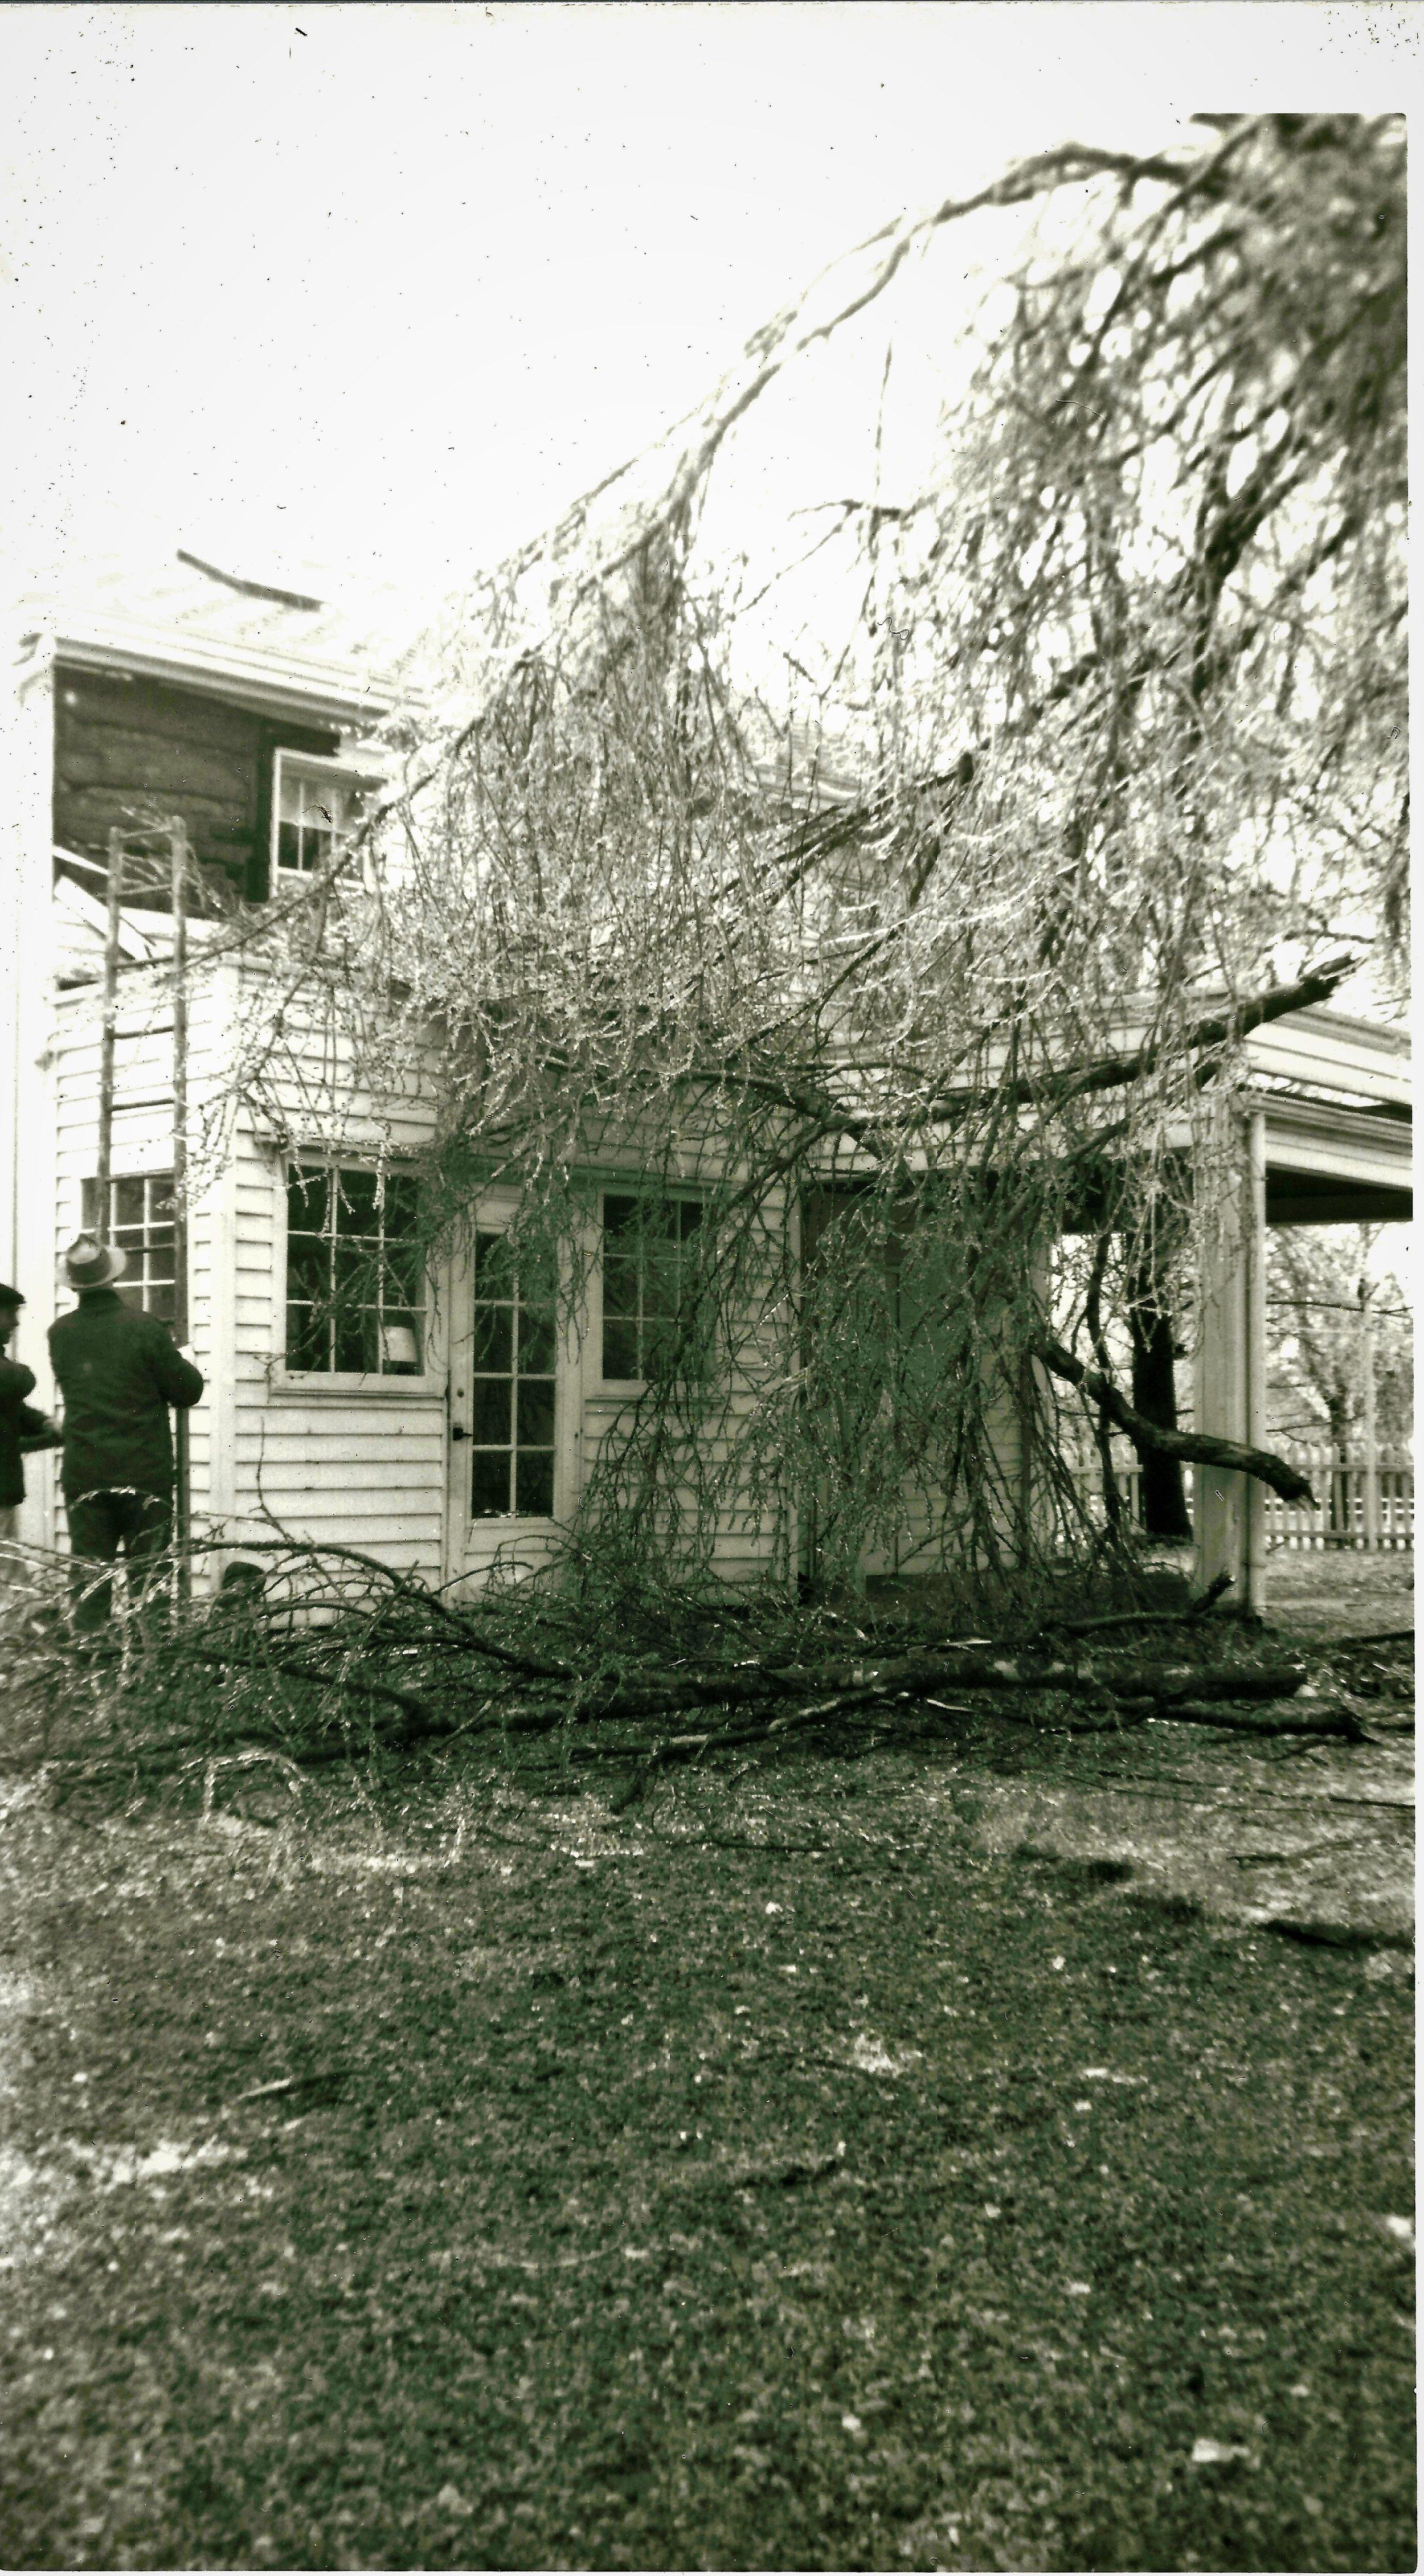 1962 ice storm 310 hamilton Ave Trenton Oh.jpg